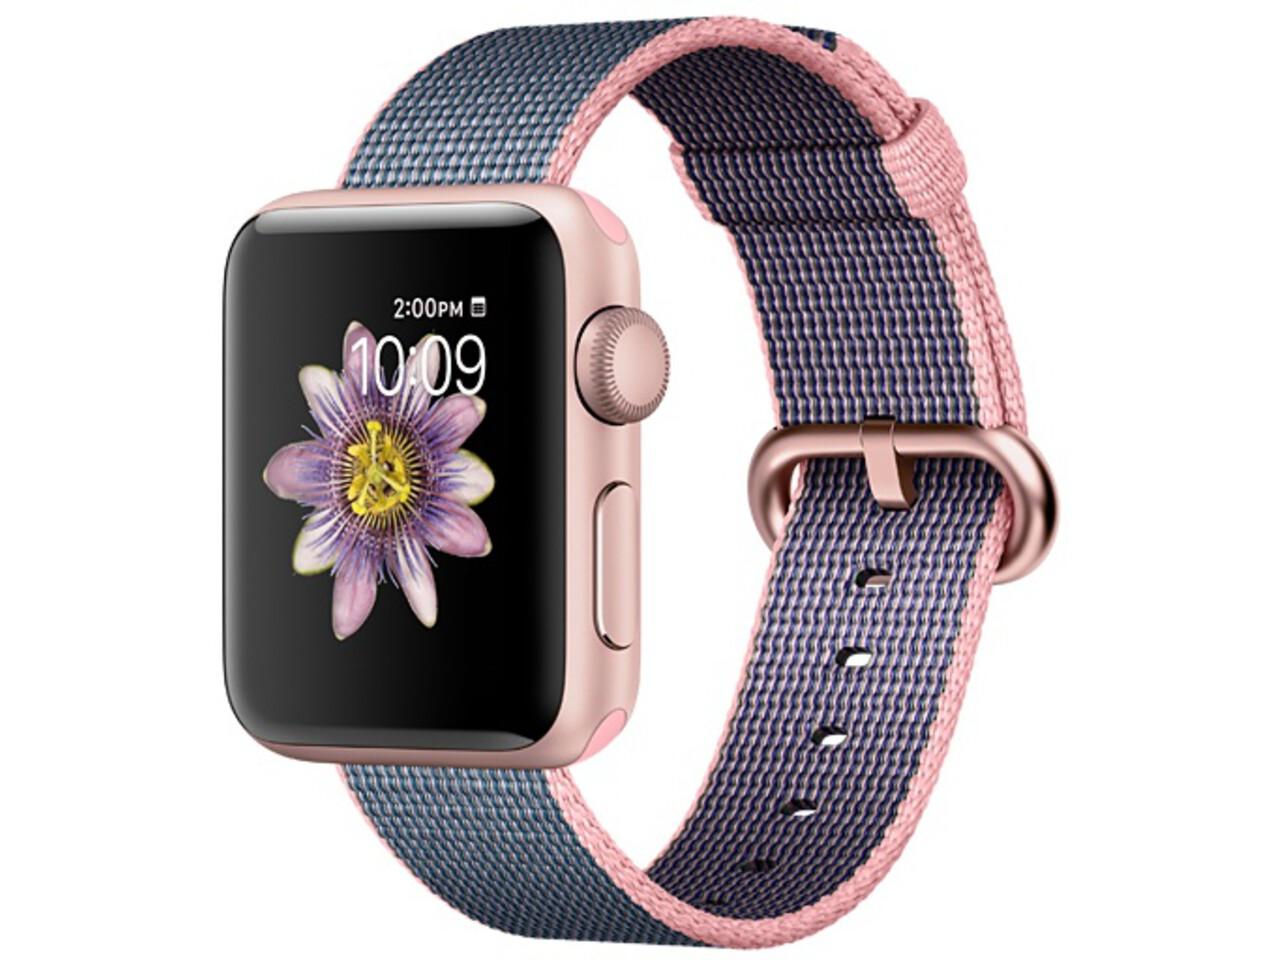 apple watch series 2 38mm rose gold aluminum light pinkmidnight blue woven nylon band